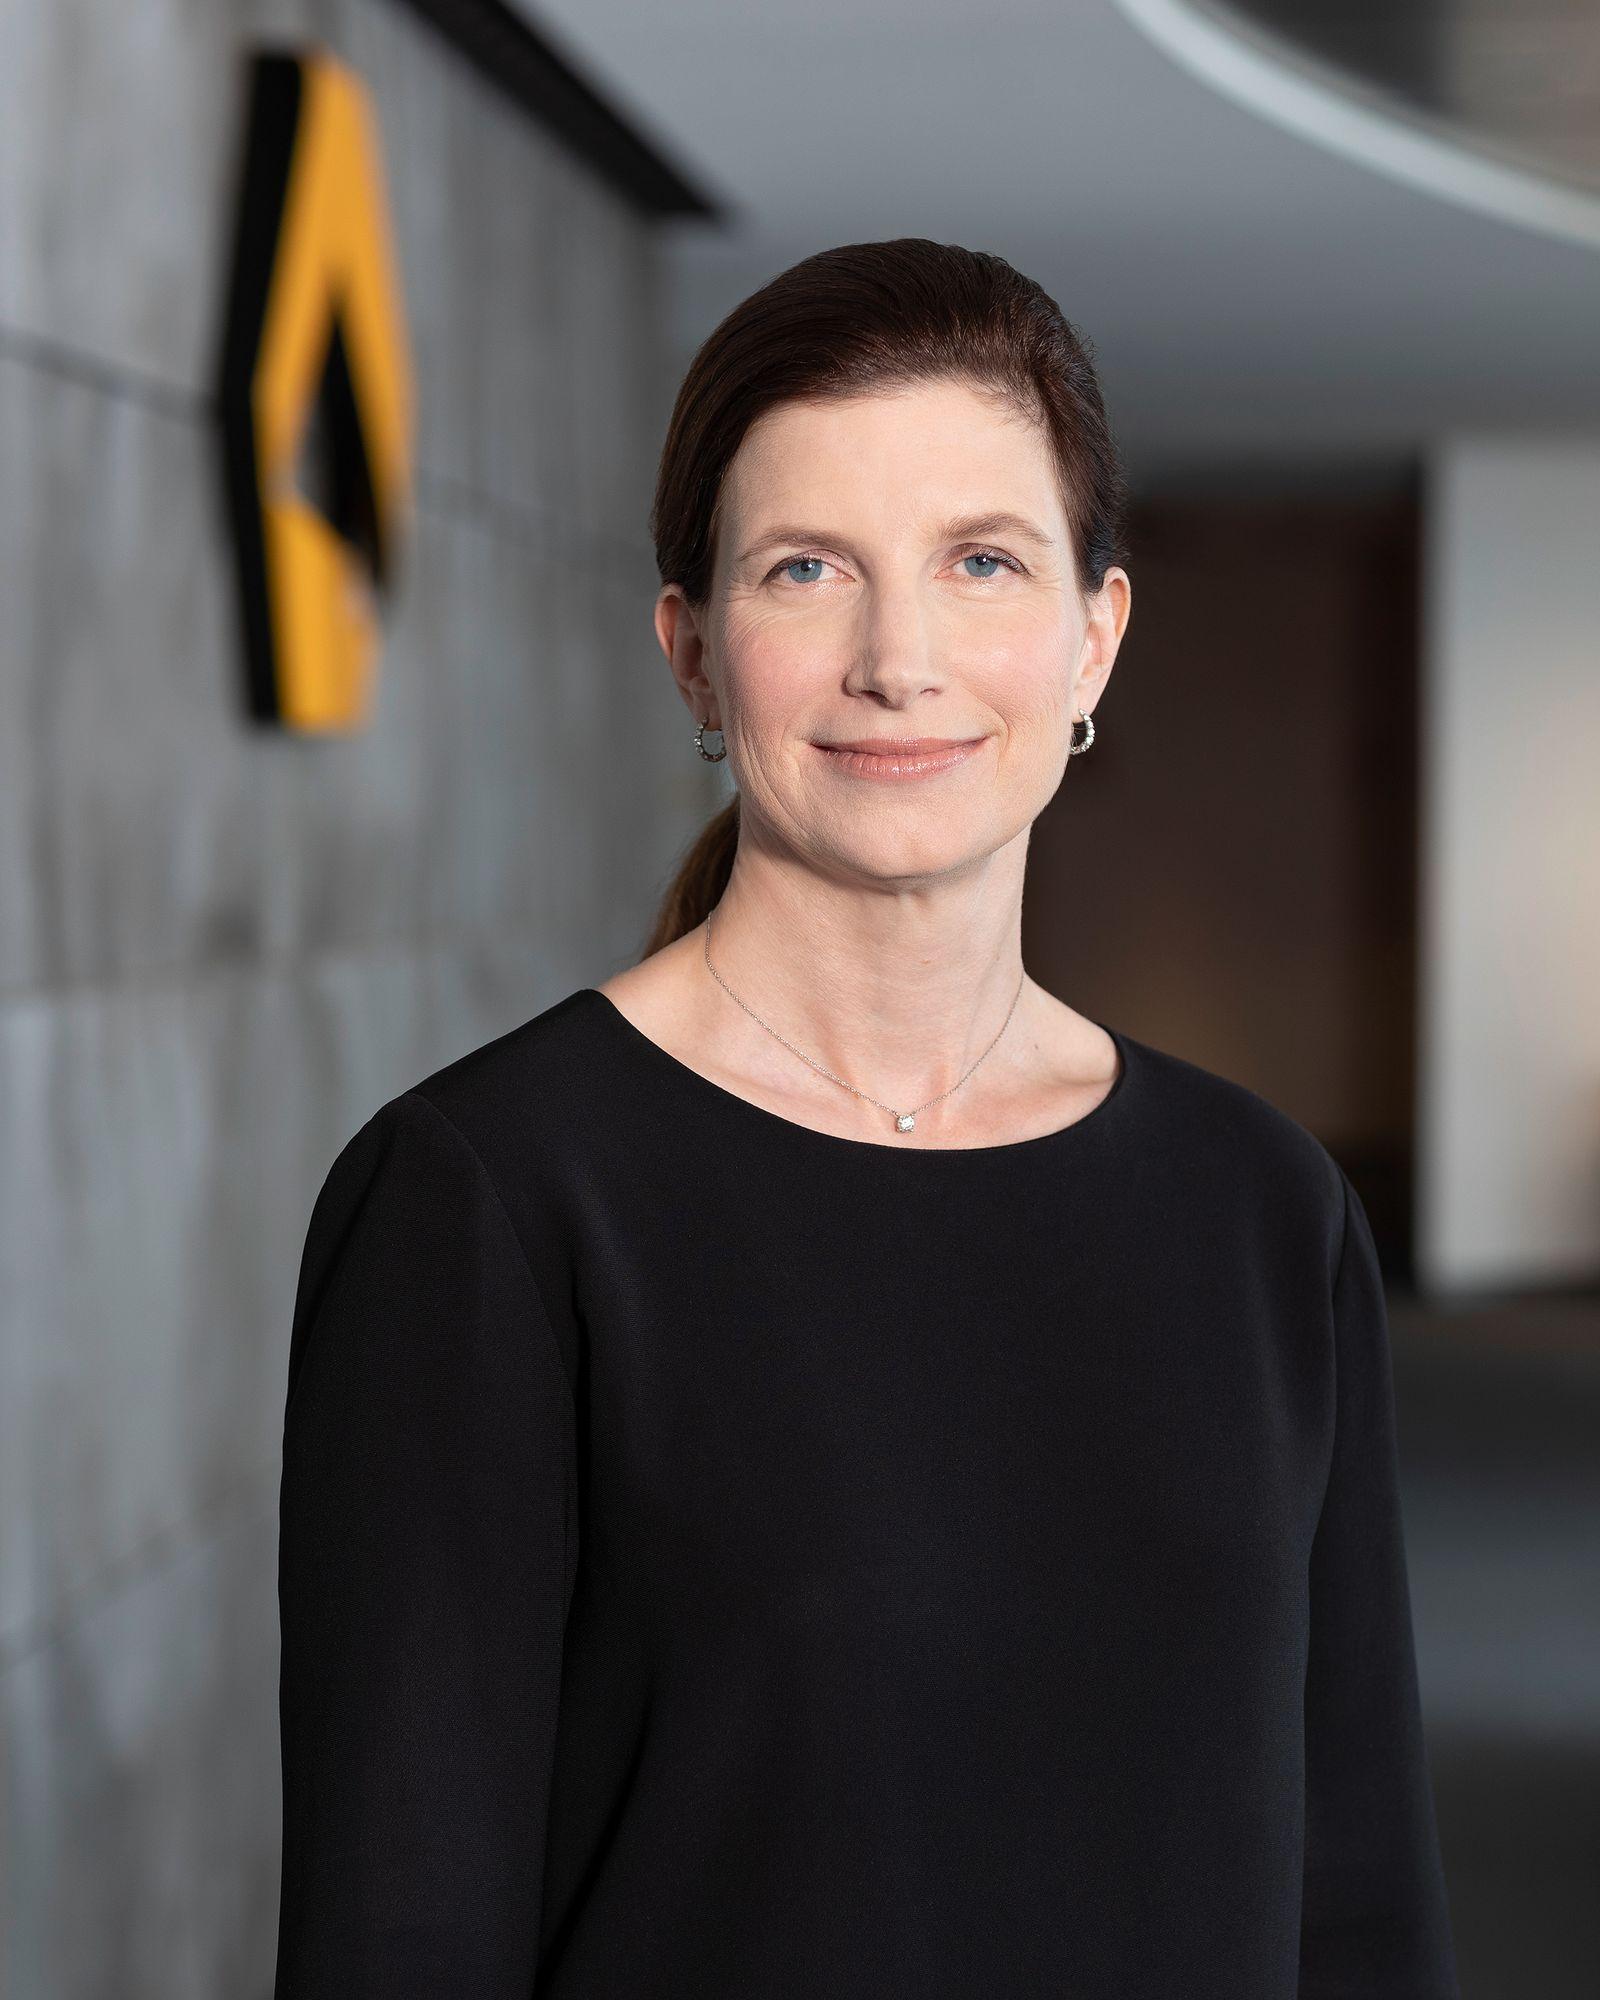 Dr. Bettina Orlopp